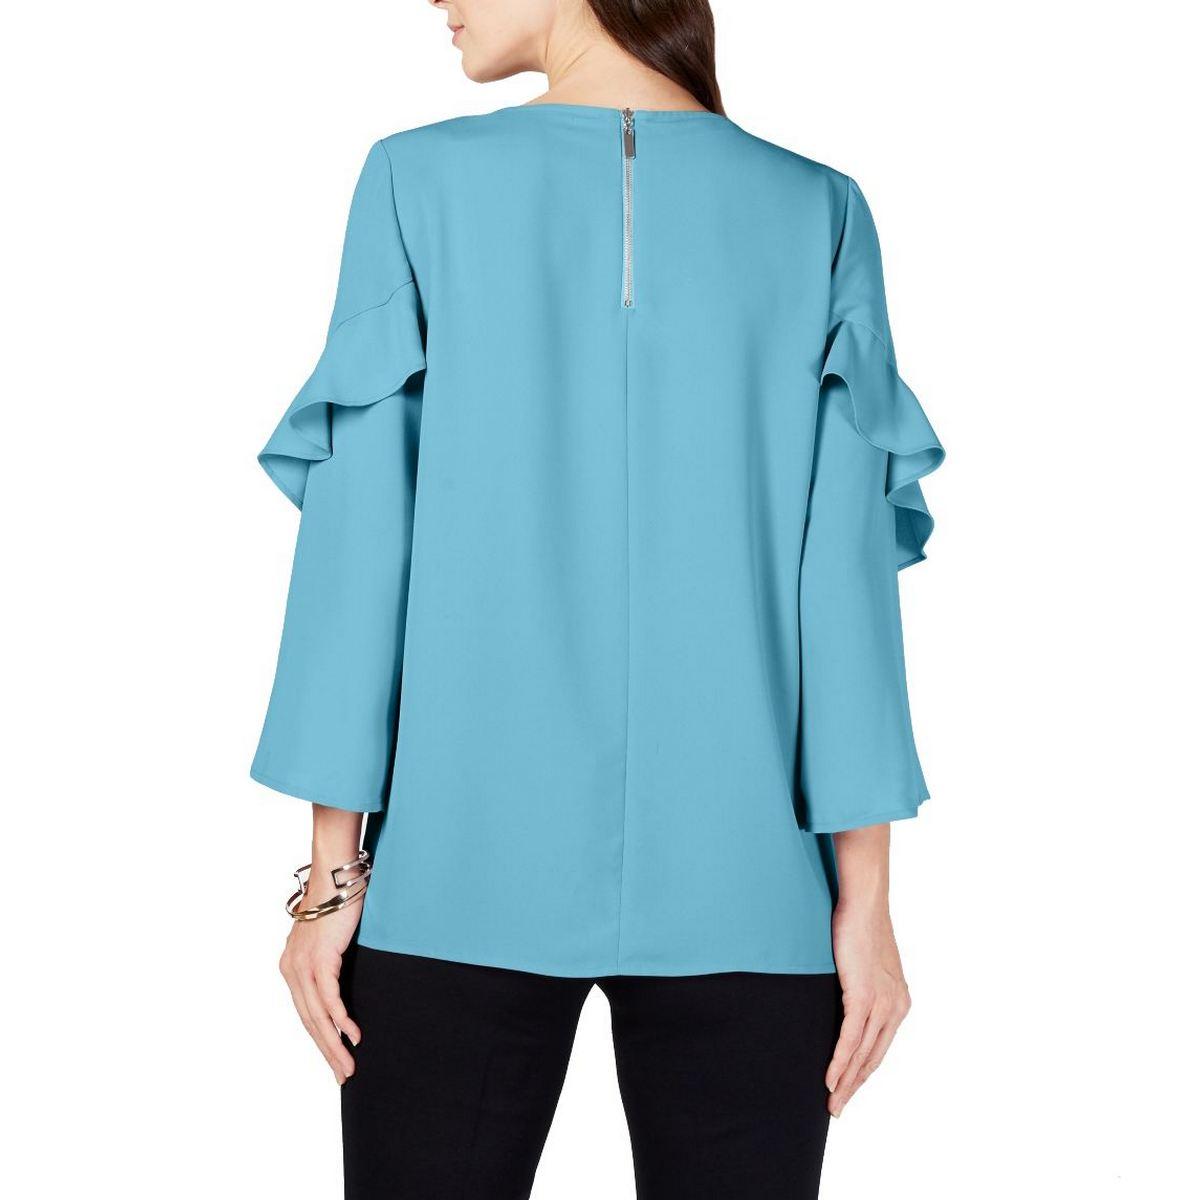 ALFANI-NEW-Women-039-s-3-4-Ruffled-sleeve-Zip-back-Blouse-Shirt-Top-TEDO thumbnail 4